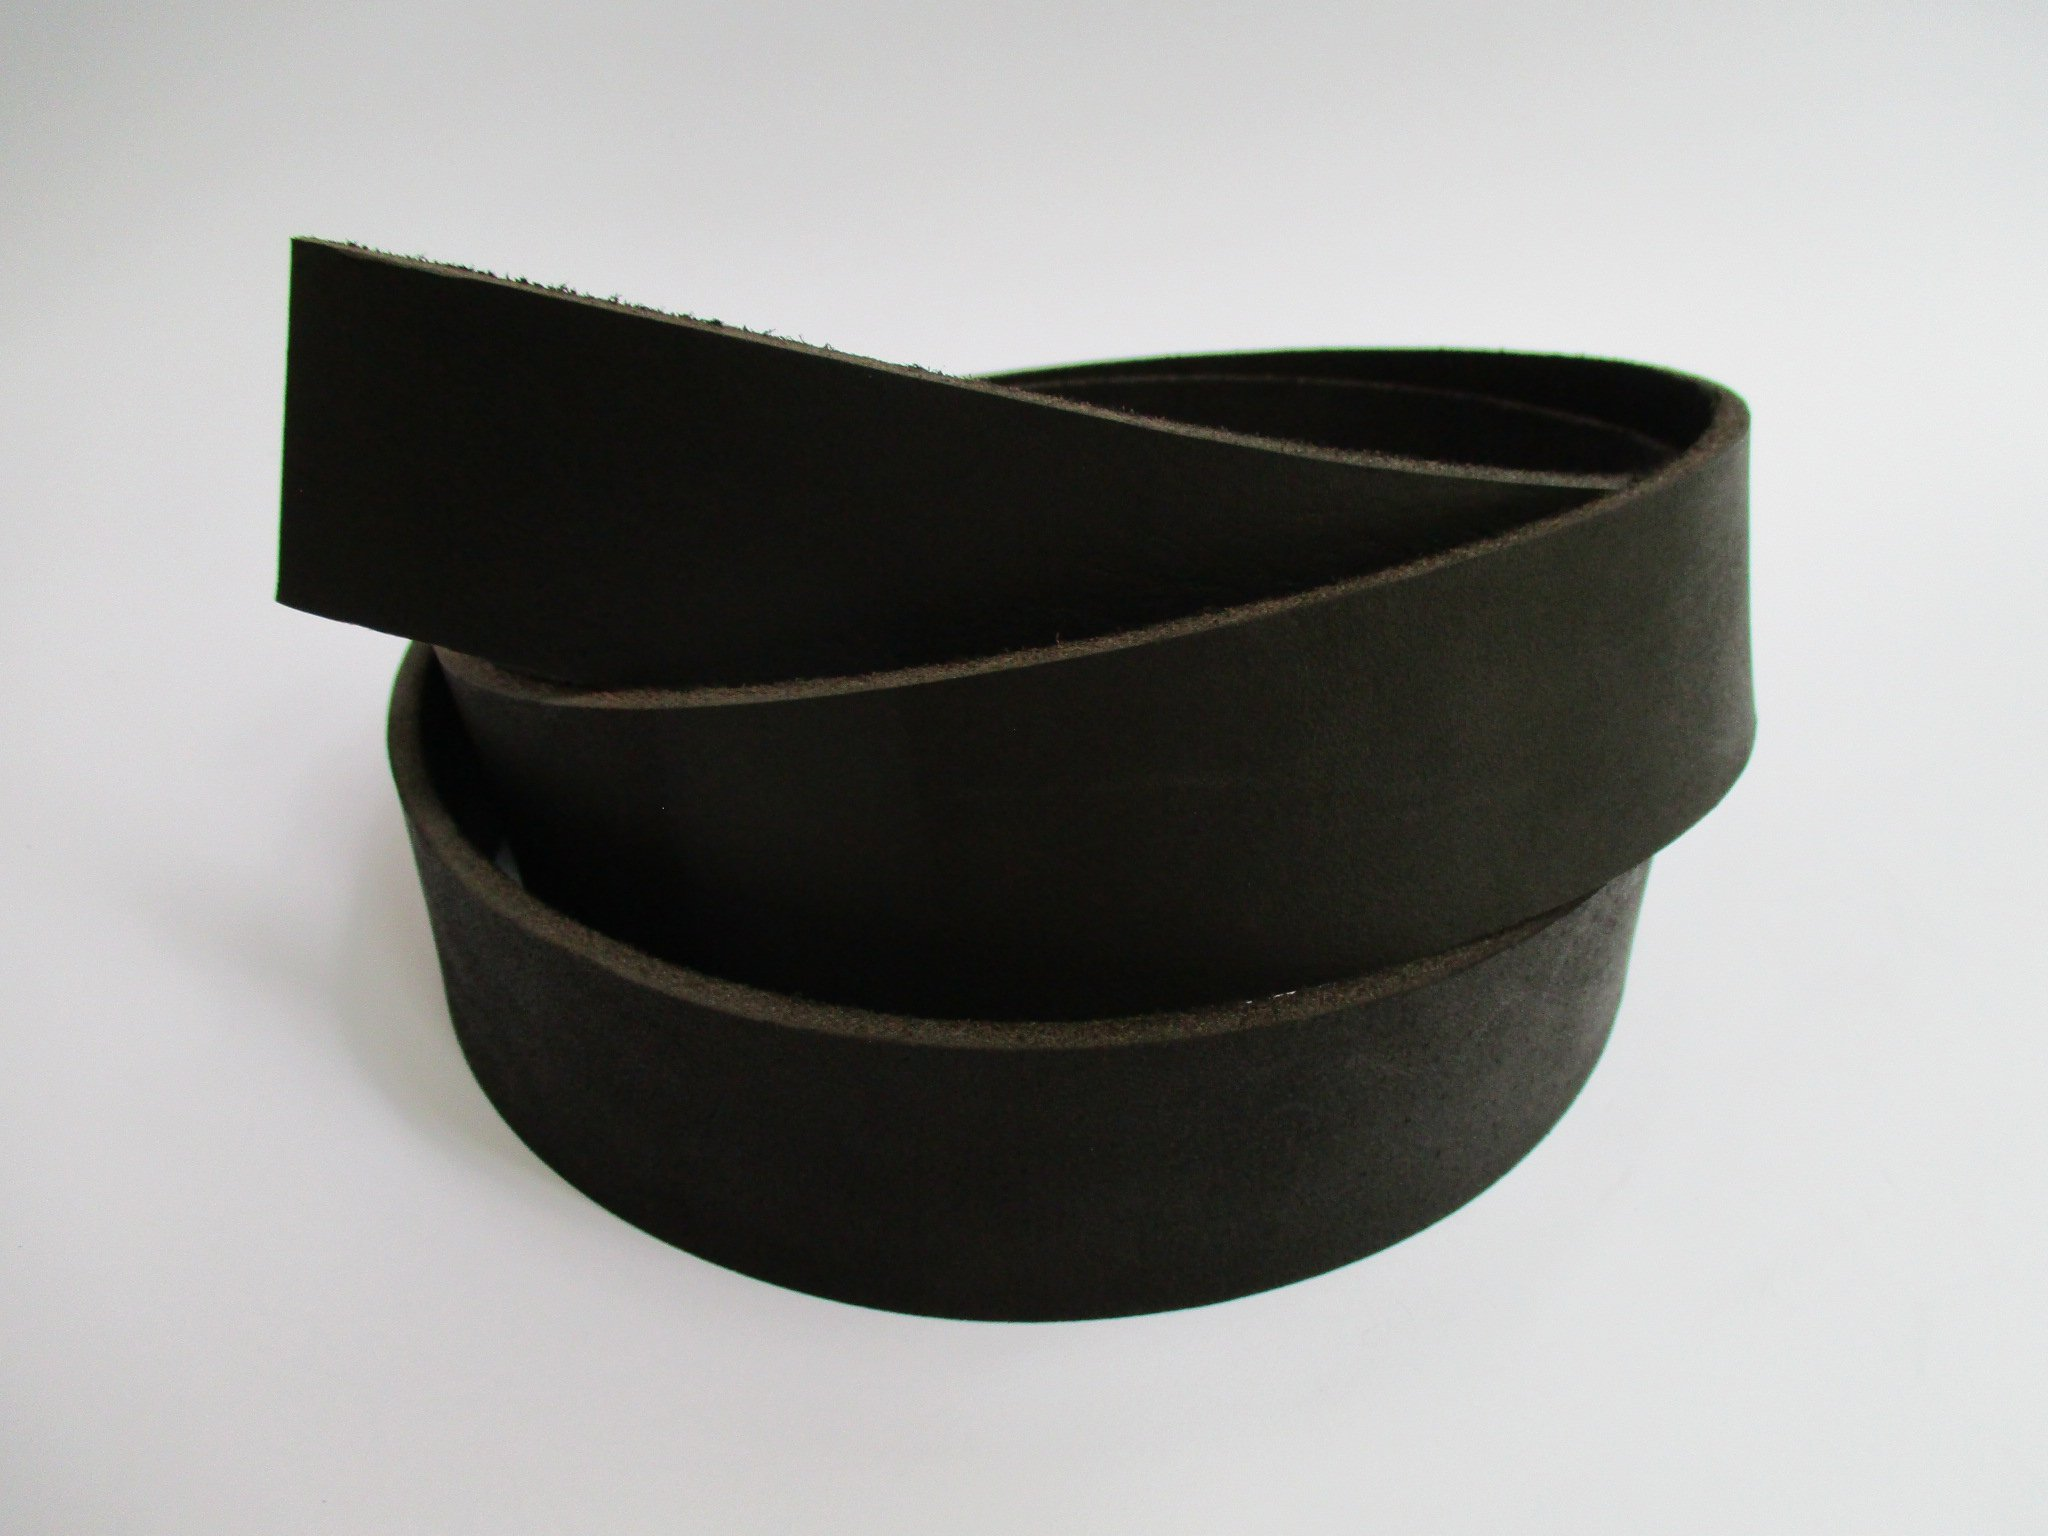 8 oz 51-59''. Black Genuine Natural Leather Belt Blank Strip Strap Band. (1 1/2'' (38mm.)) by Lipskiy